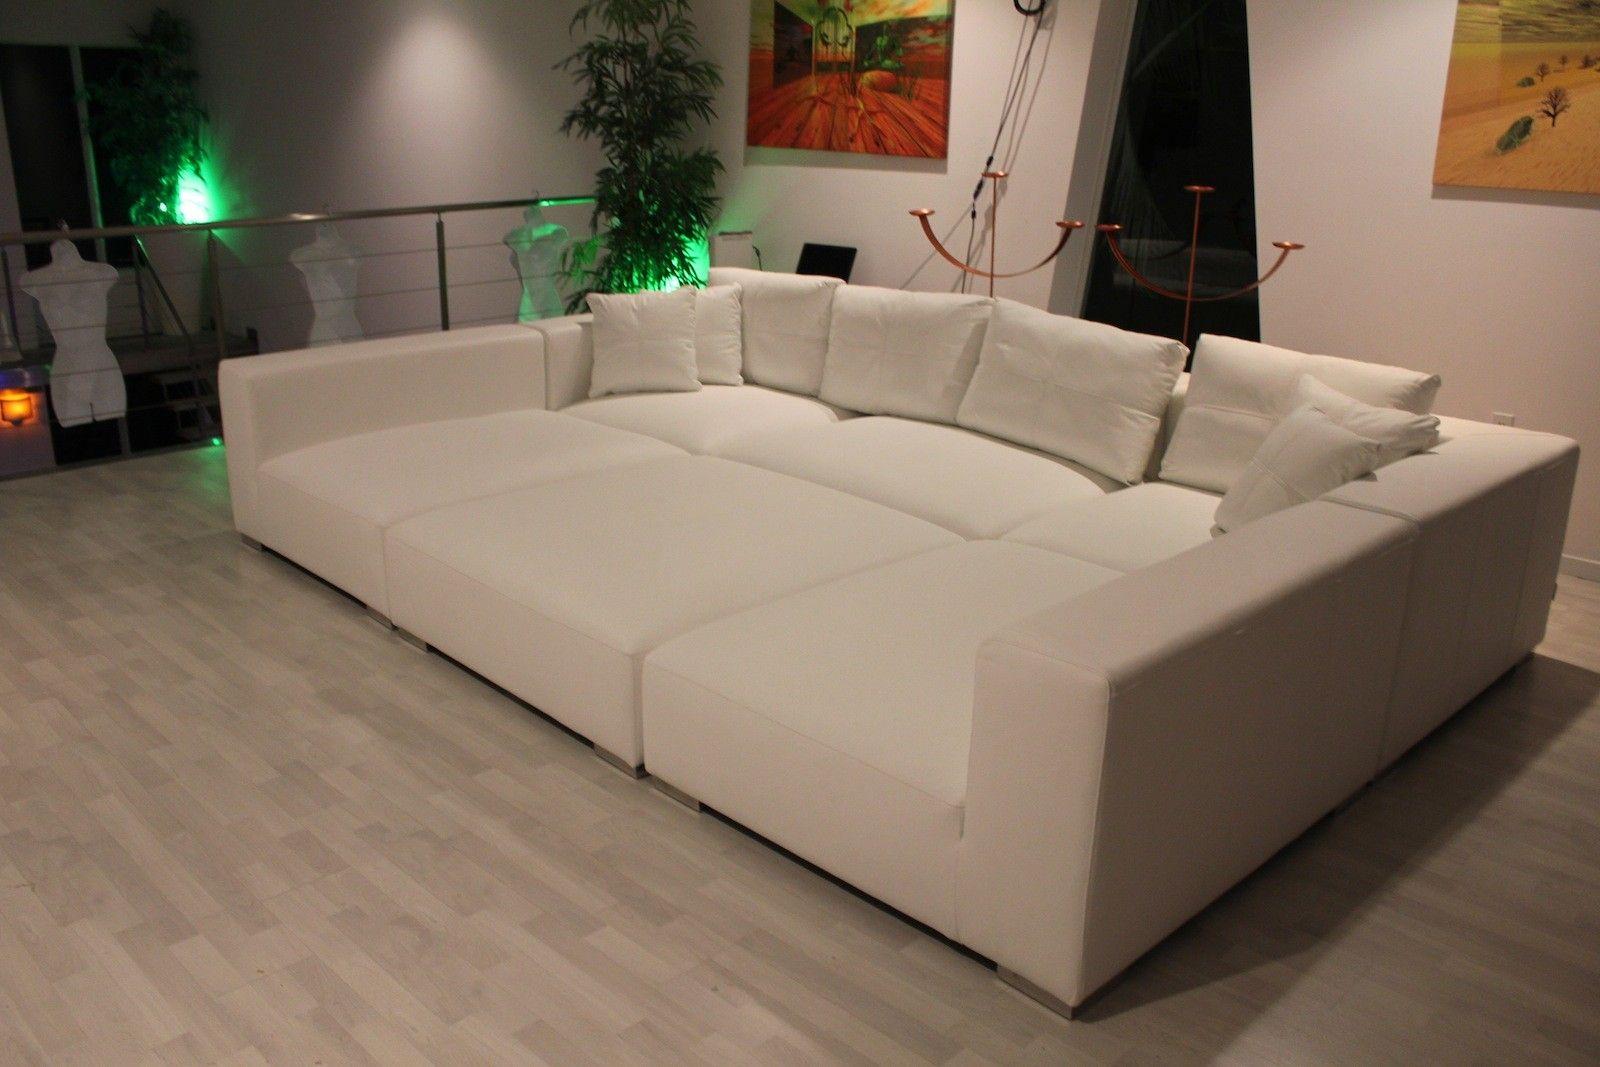 Contemporary Sofa Pits For Tv Rooms Living Room Pinterest Contemporary Comfy Sofa And Room